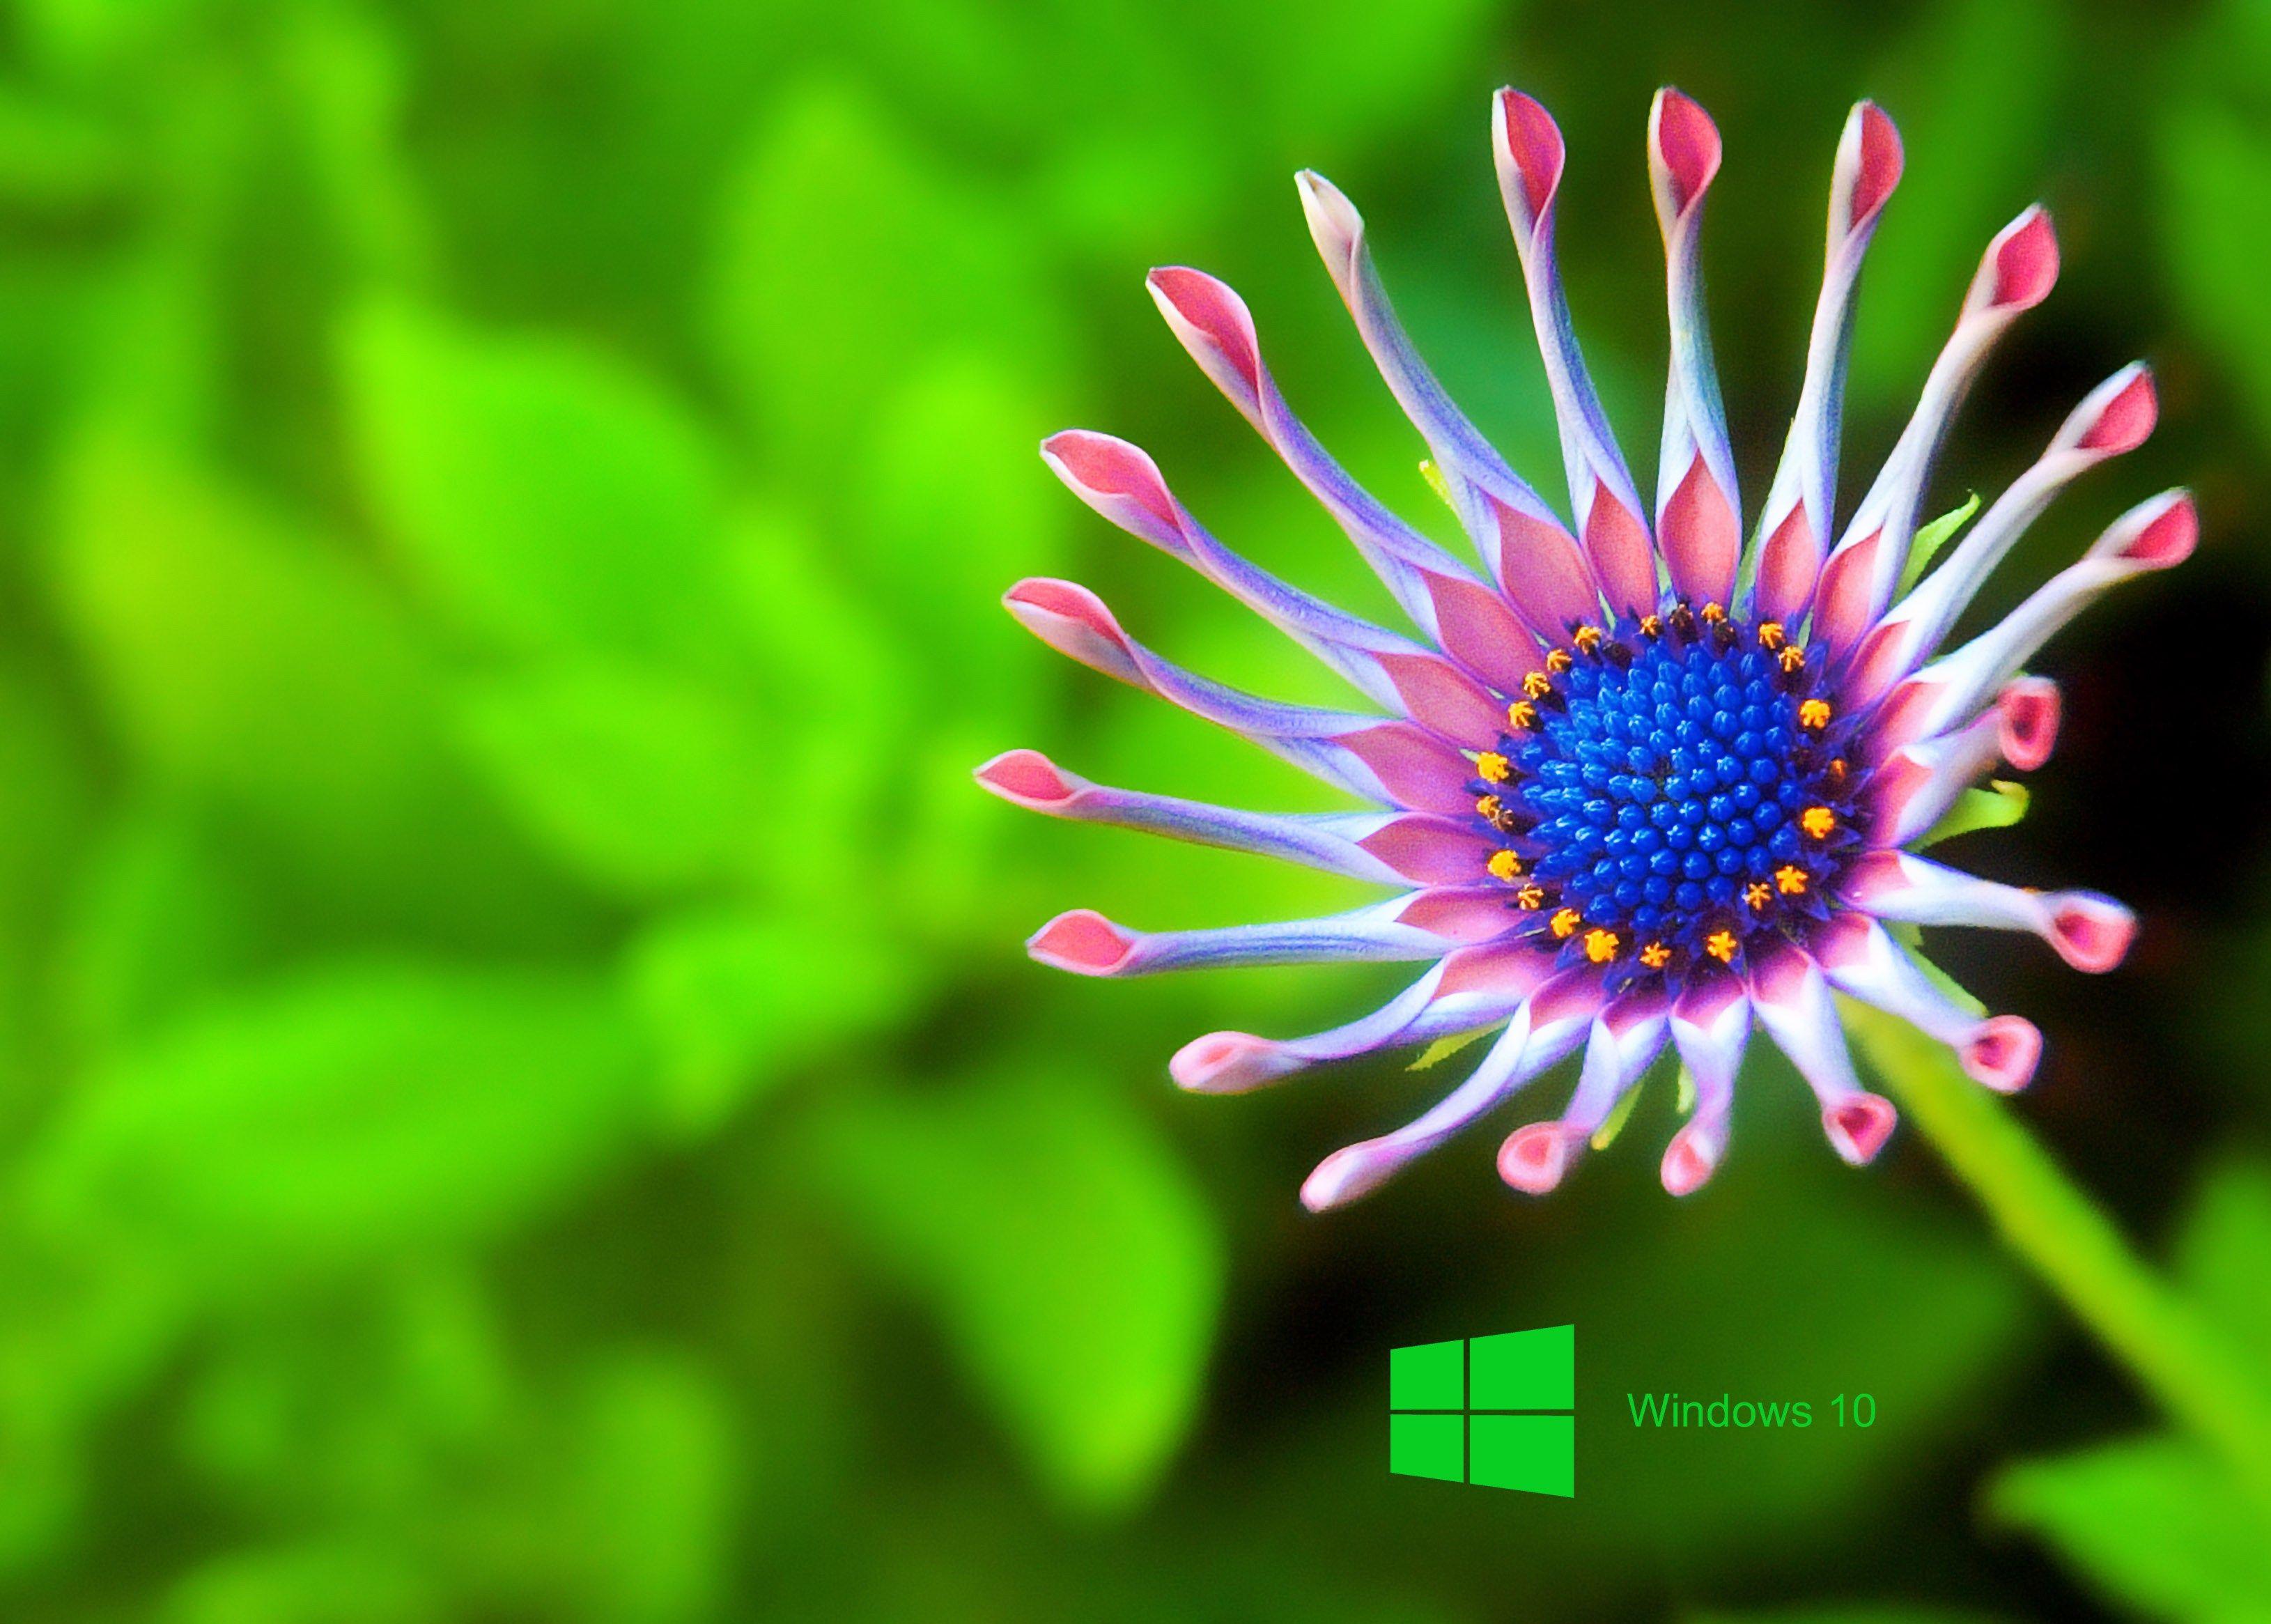 Hd Wallpaper Windows Flower Images Wallpapers Best Flower Wallpaper Macro Photography Nature